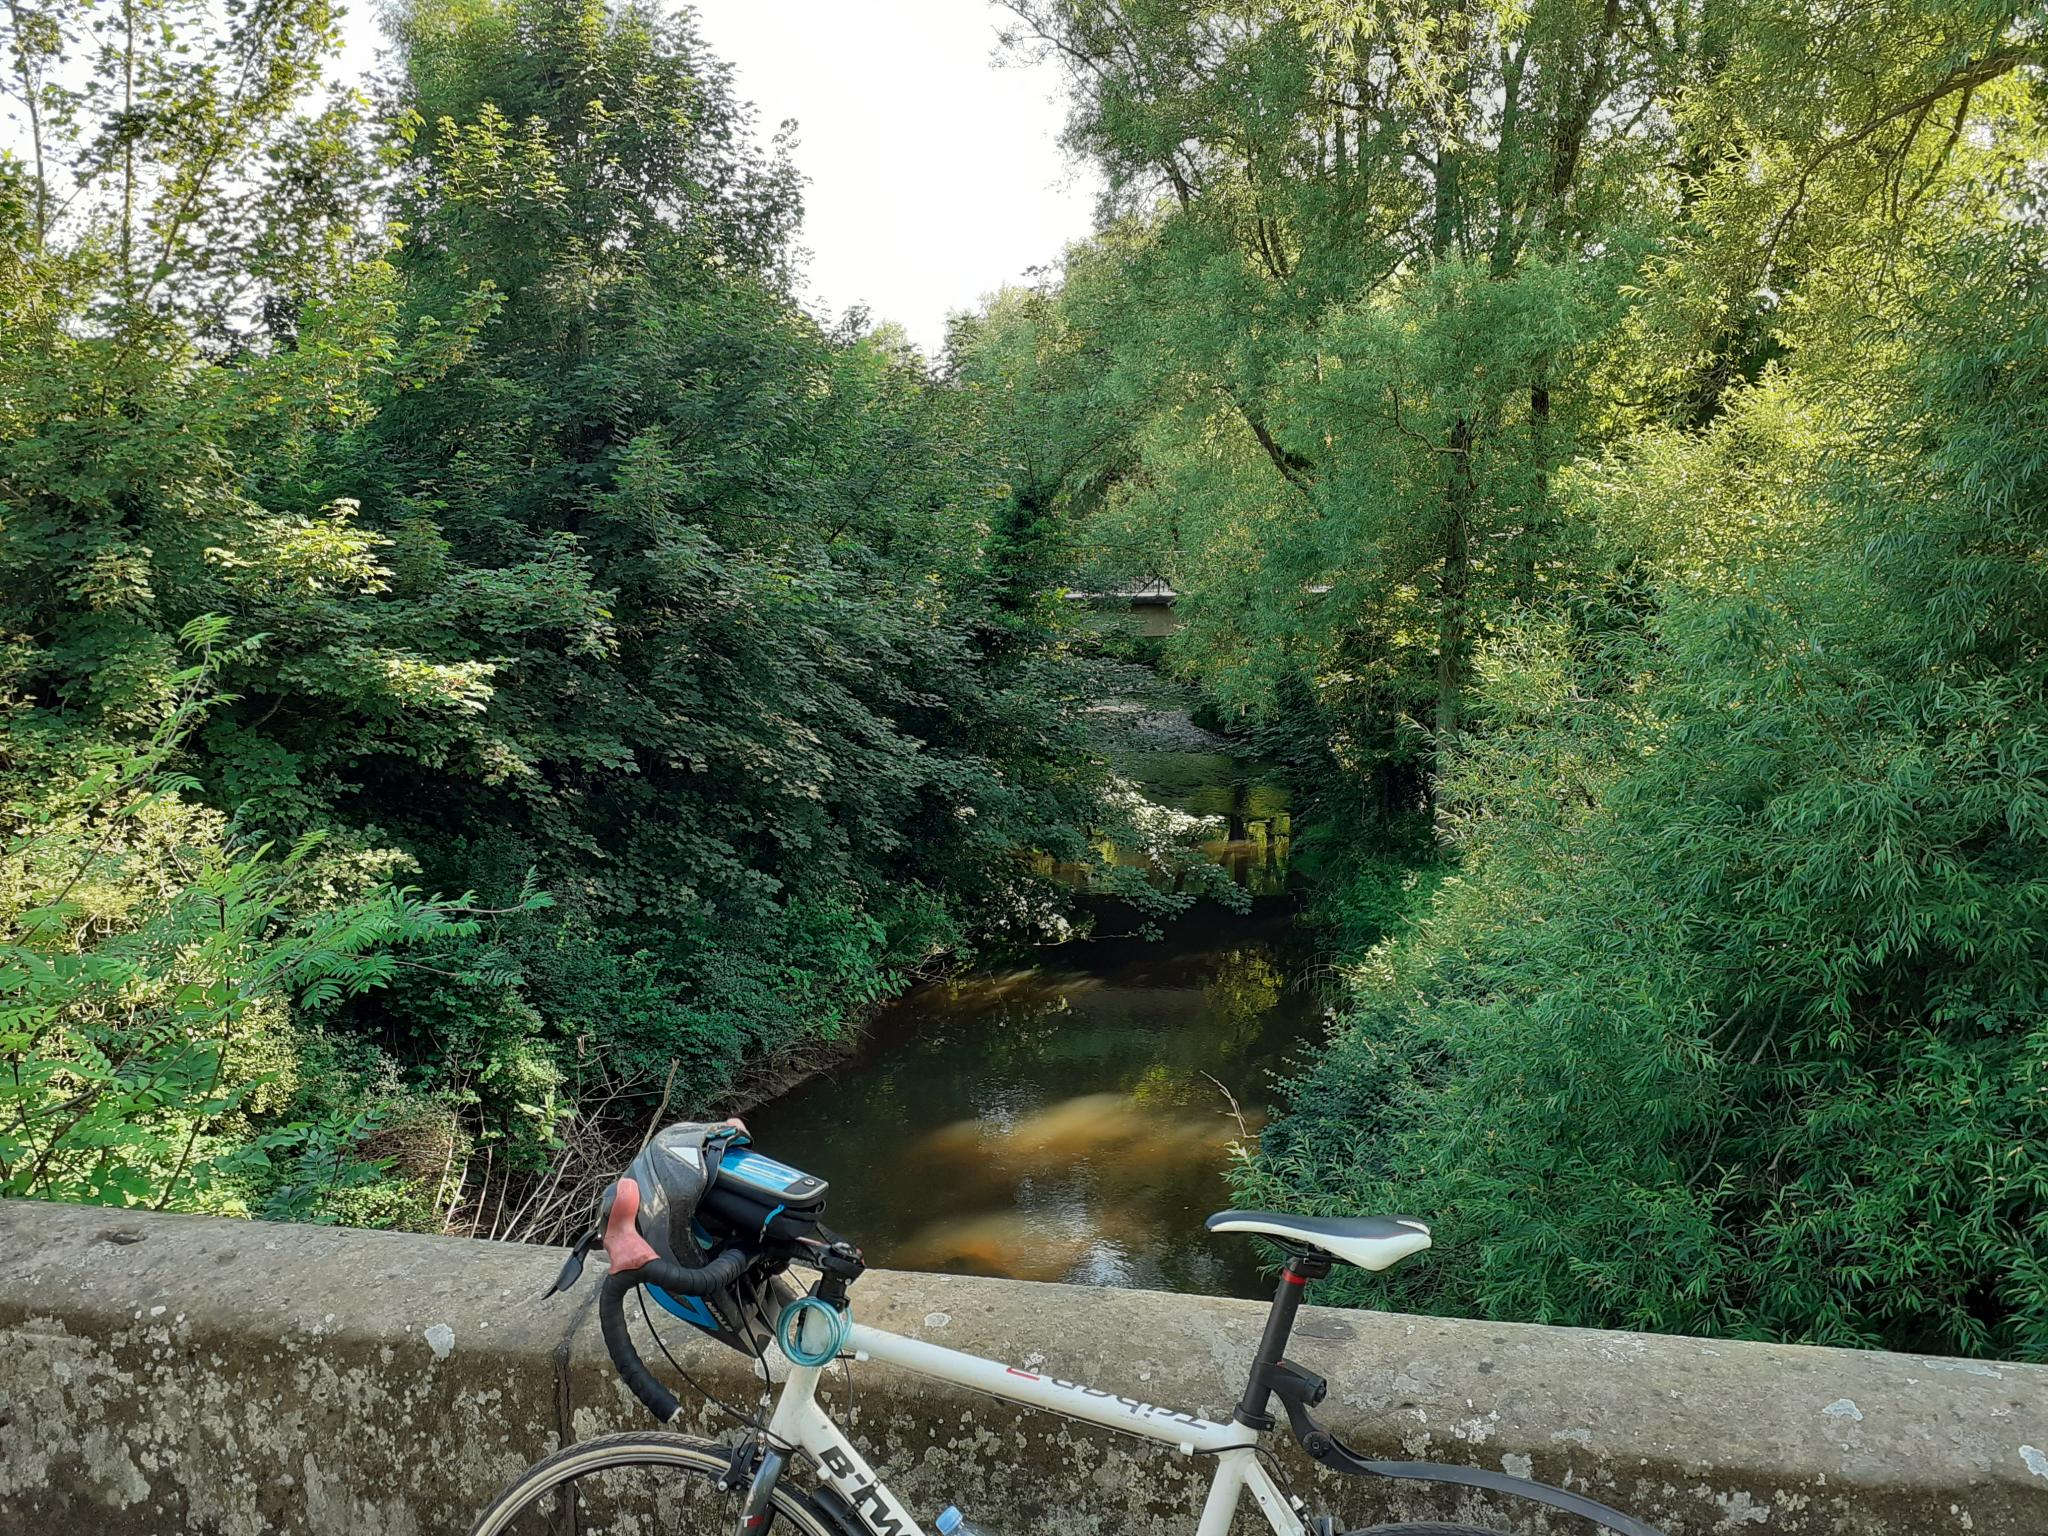 On my bike-20210718_170444-jpg